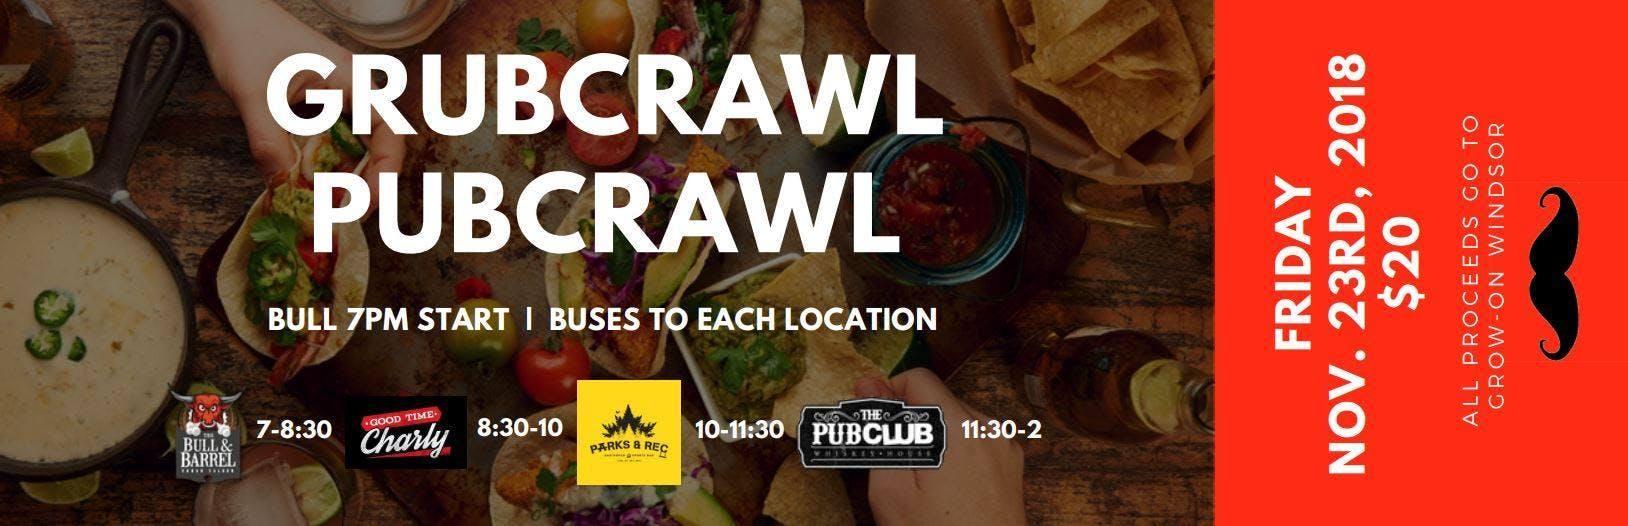 GrubCrawl PubCrawl